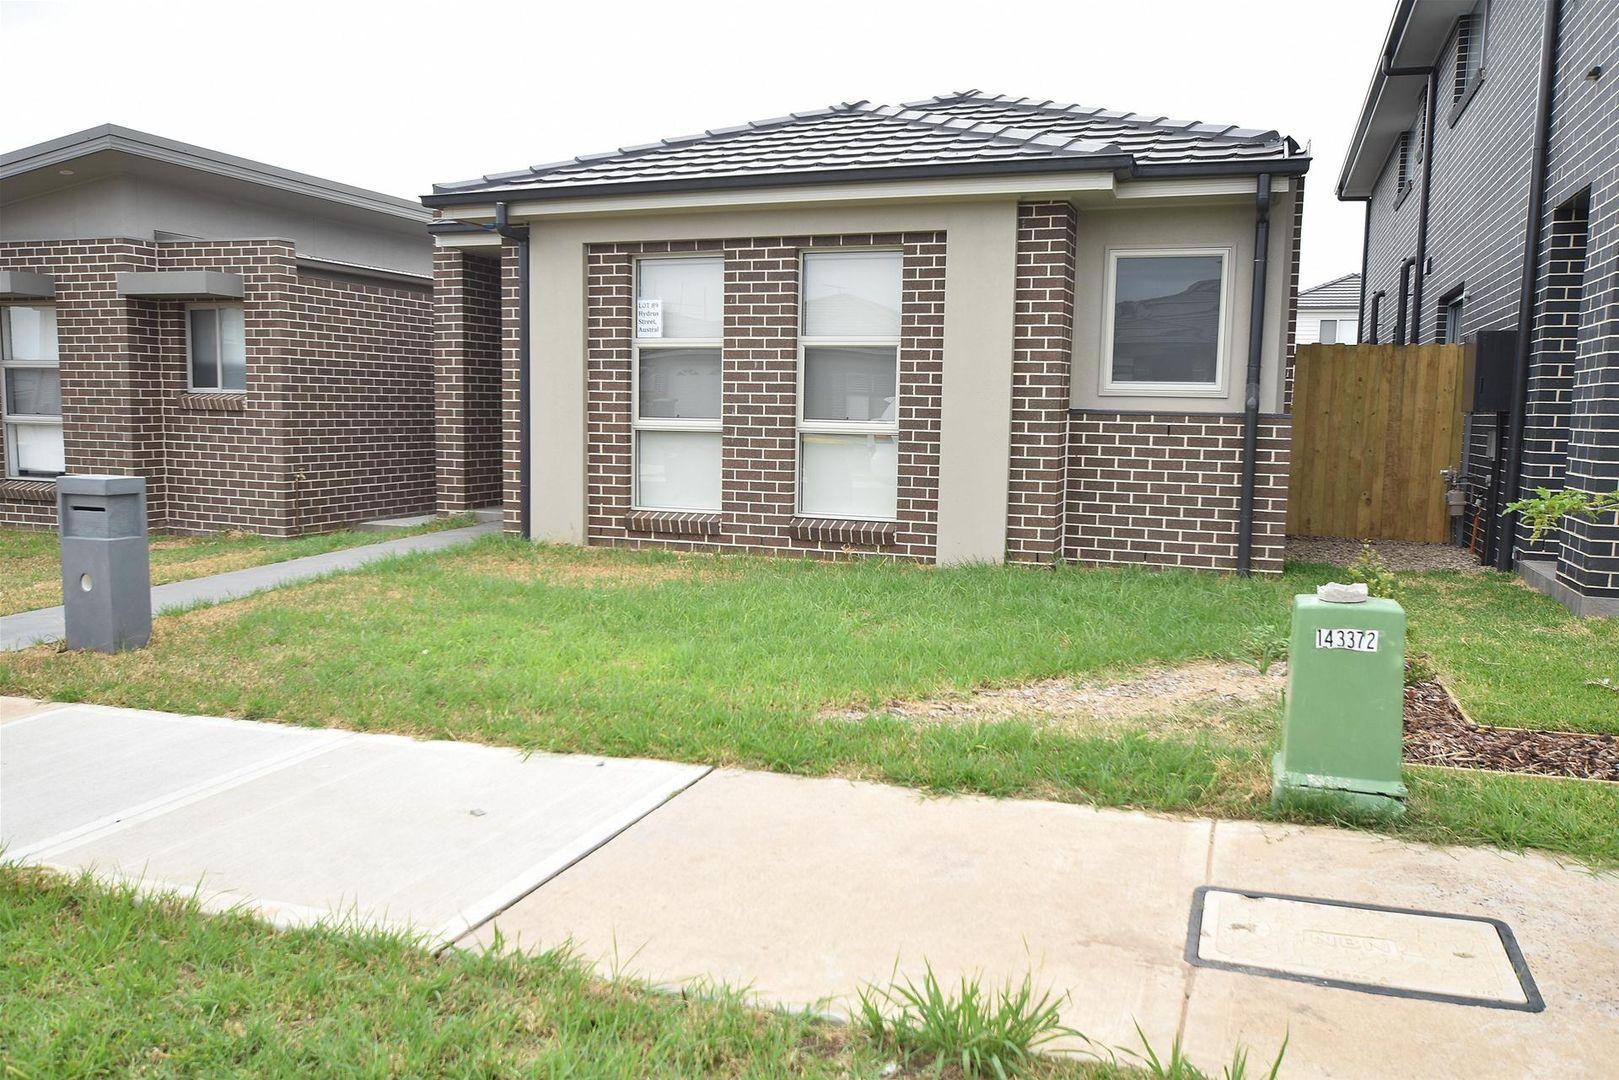 Lot 89 Hydrus Street, Austral NSW 2179, Image 0